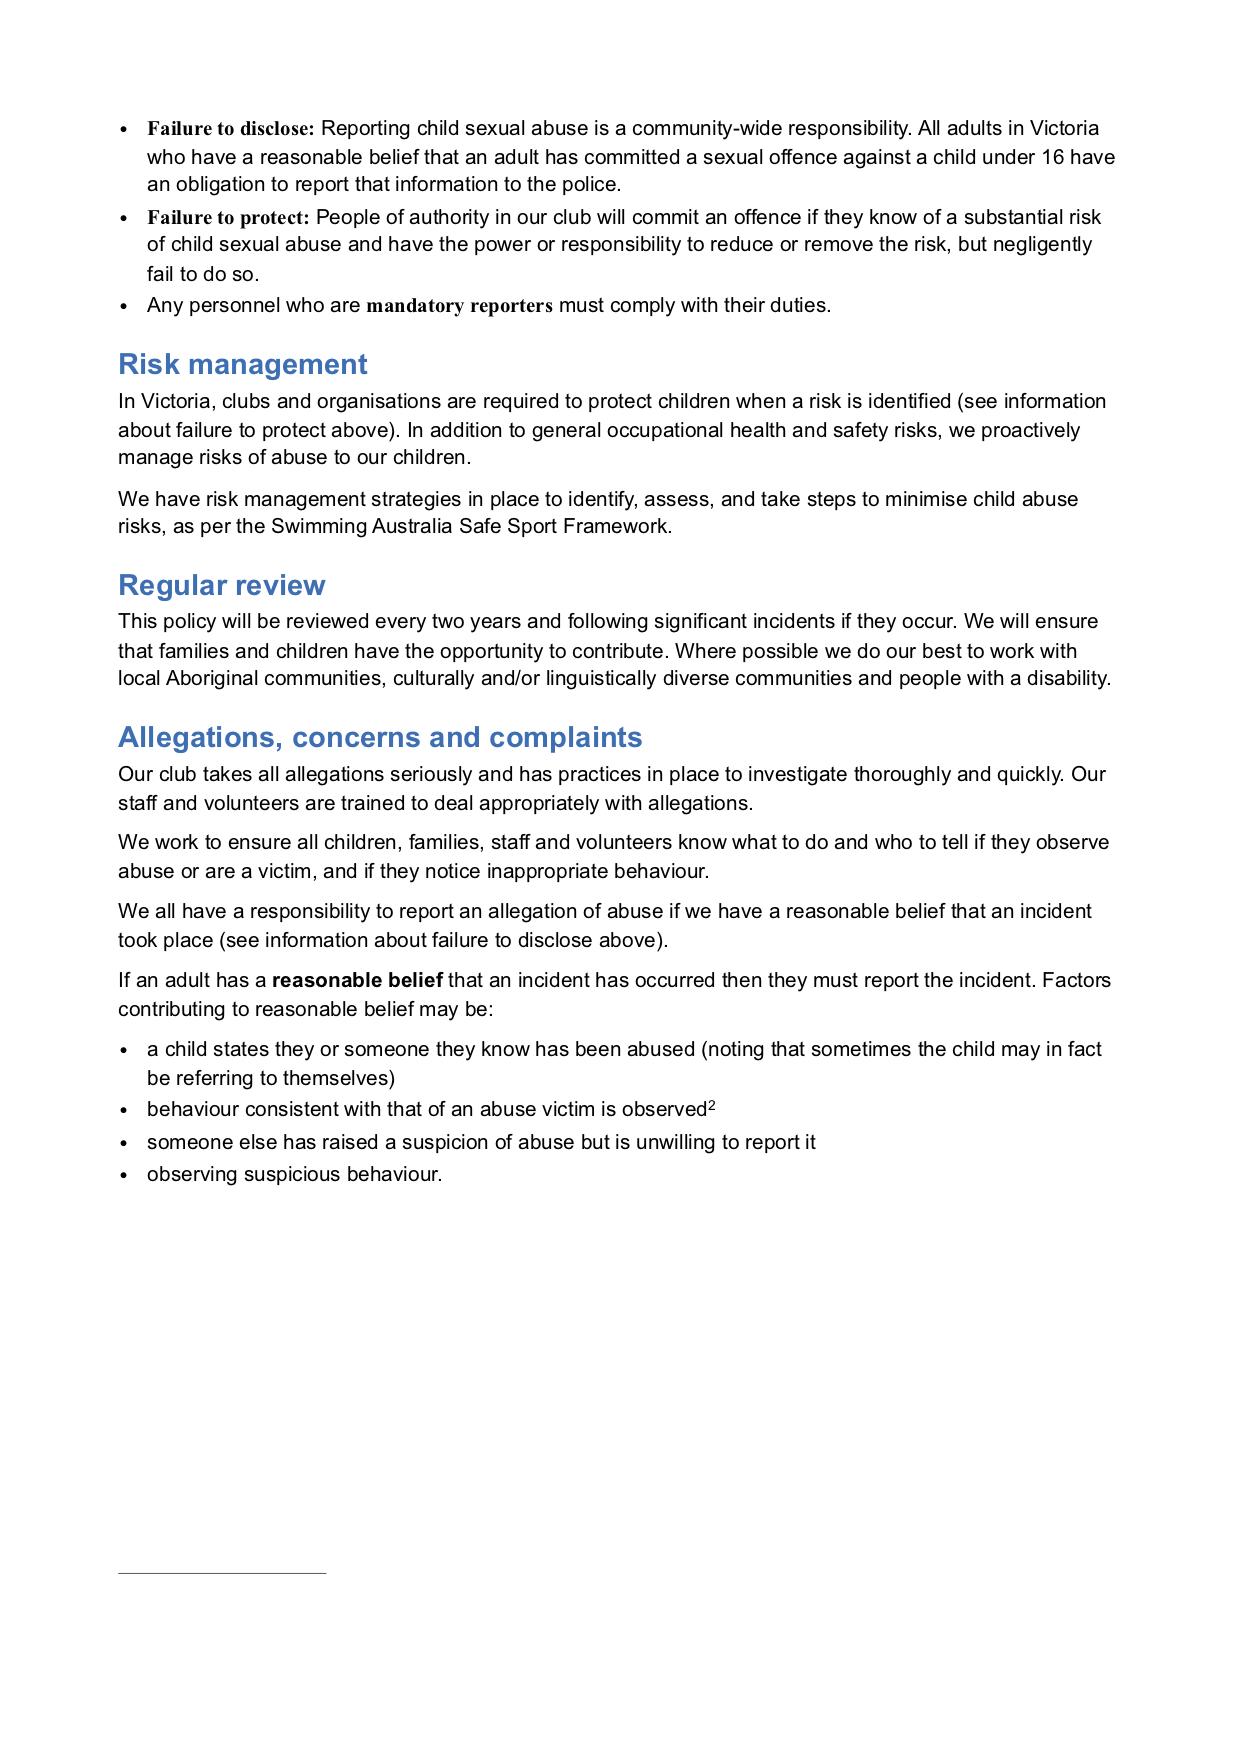 LSC Child Safety Policy 20-11-16 pg4.jpg